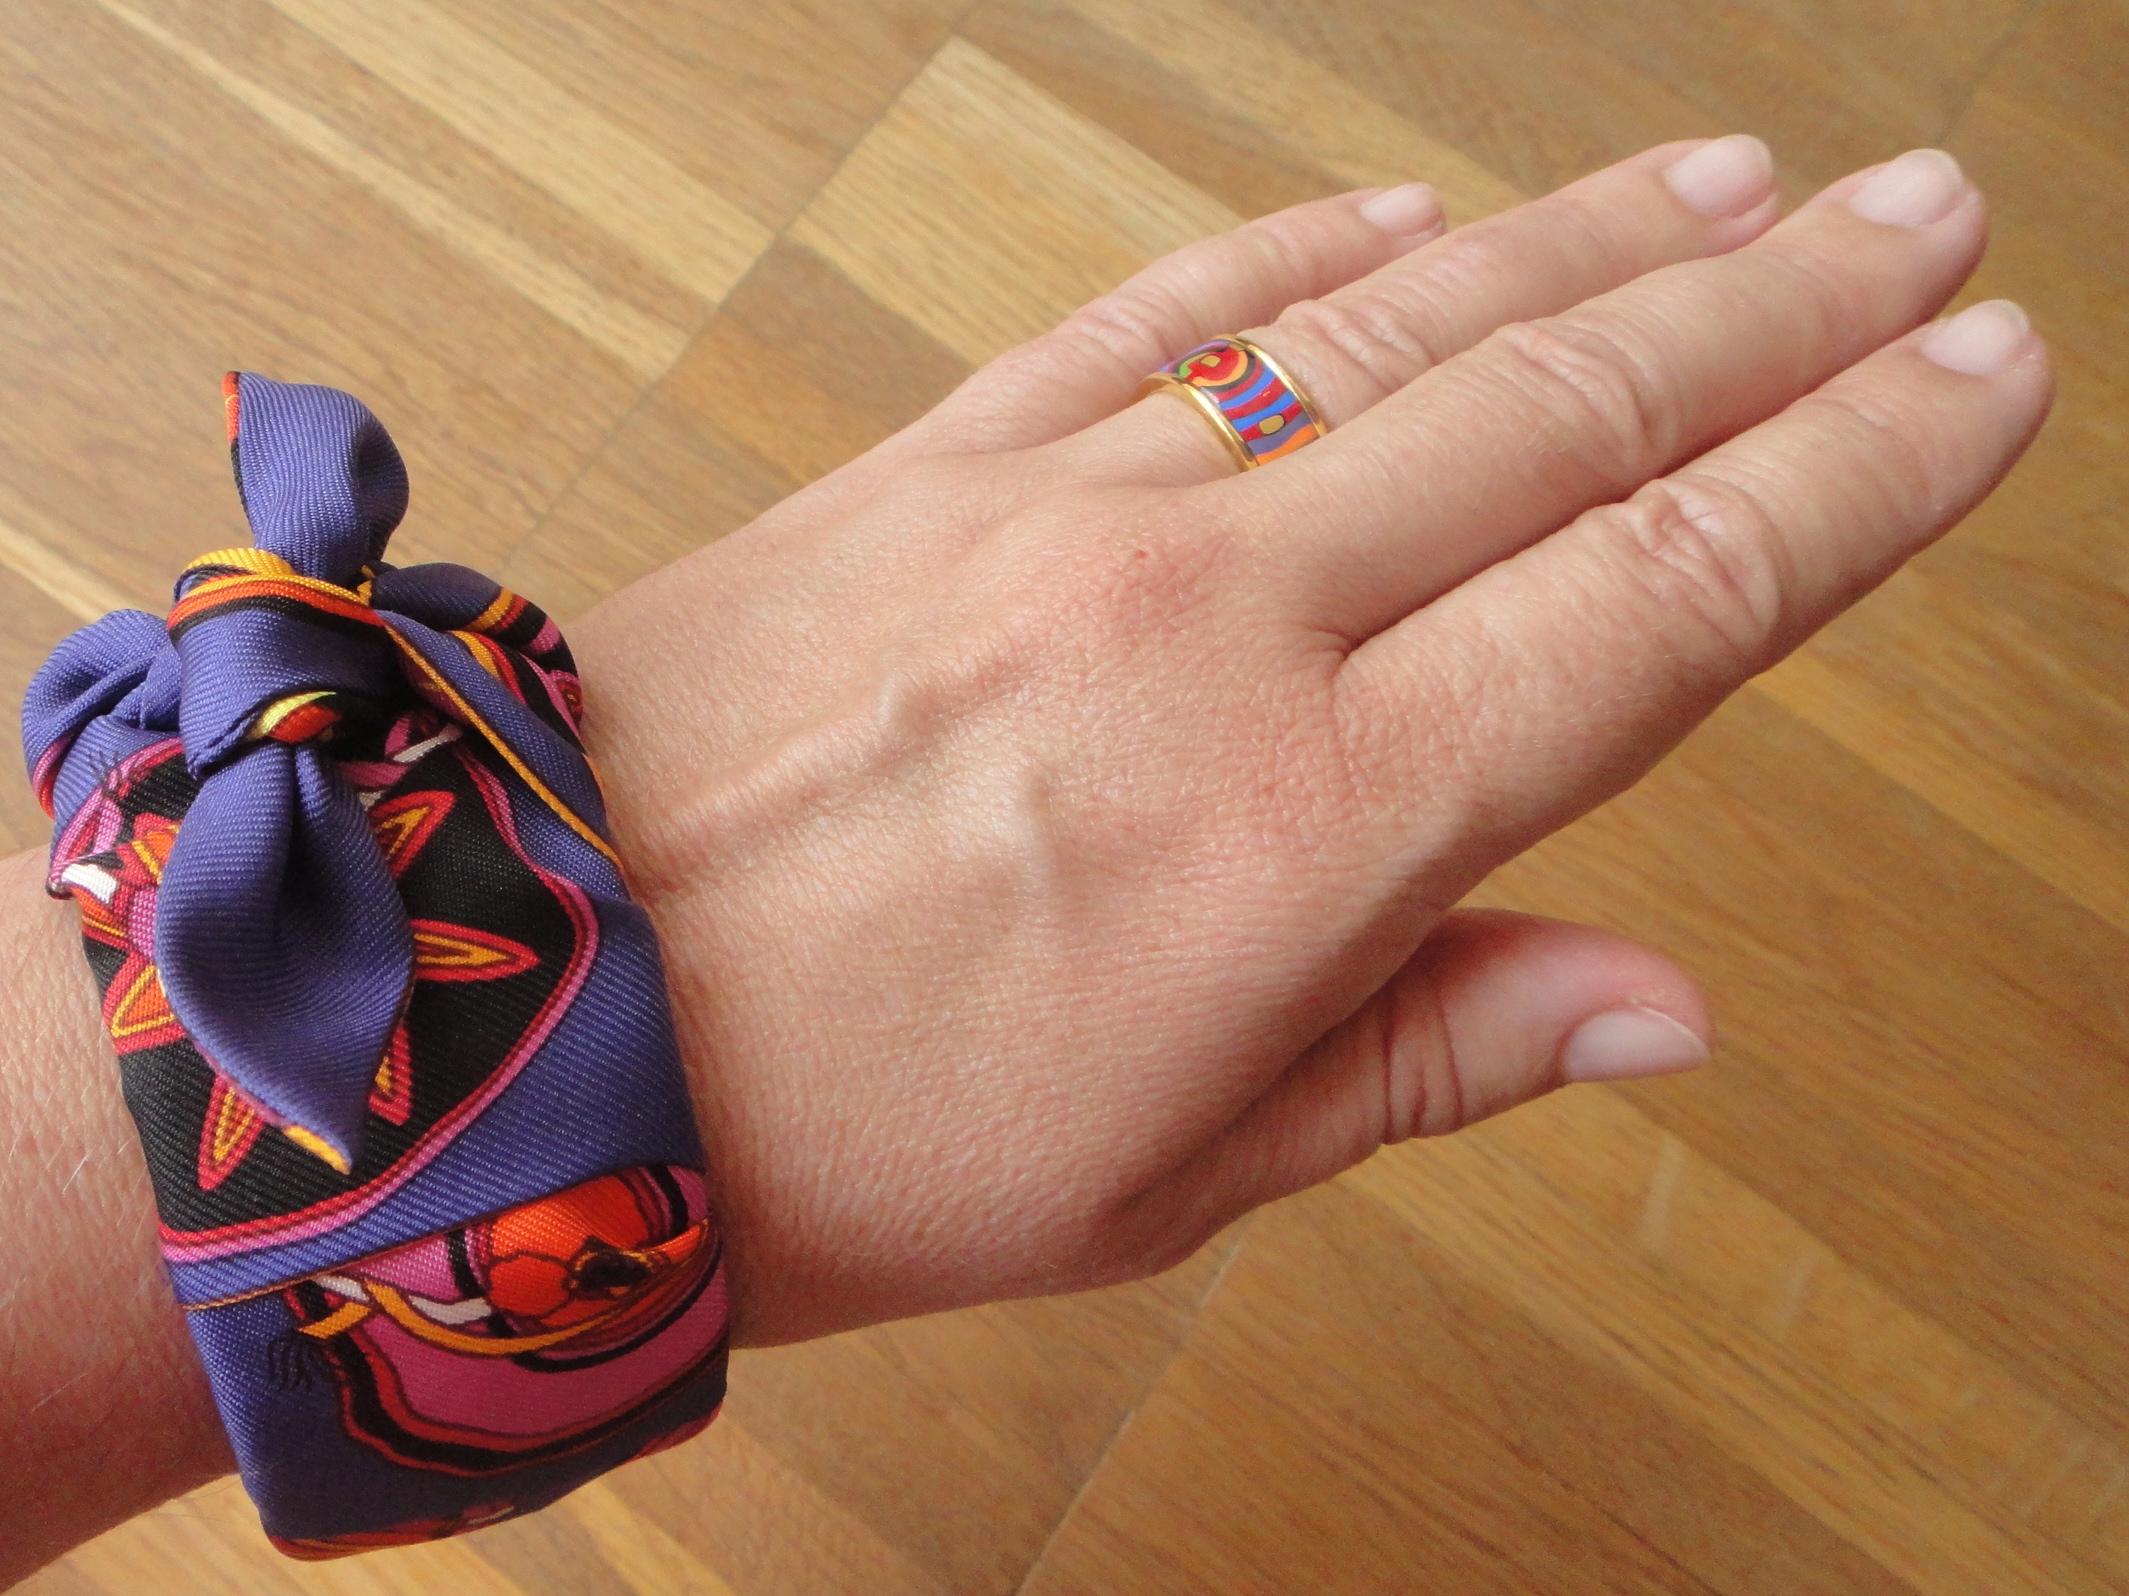 Belles du Mexique Twille & FreyWille Hundertwasser ring